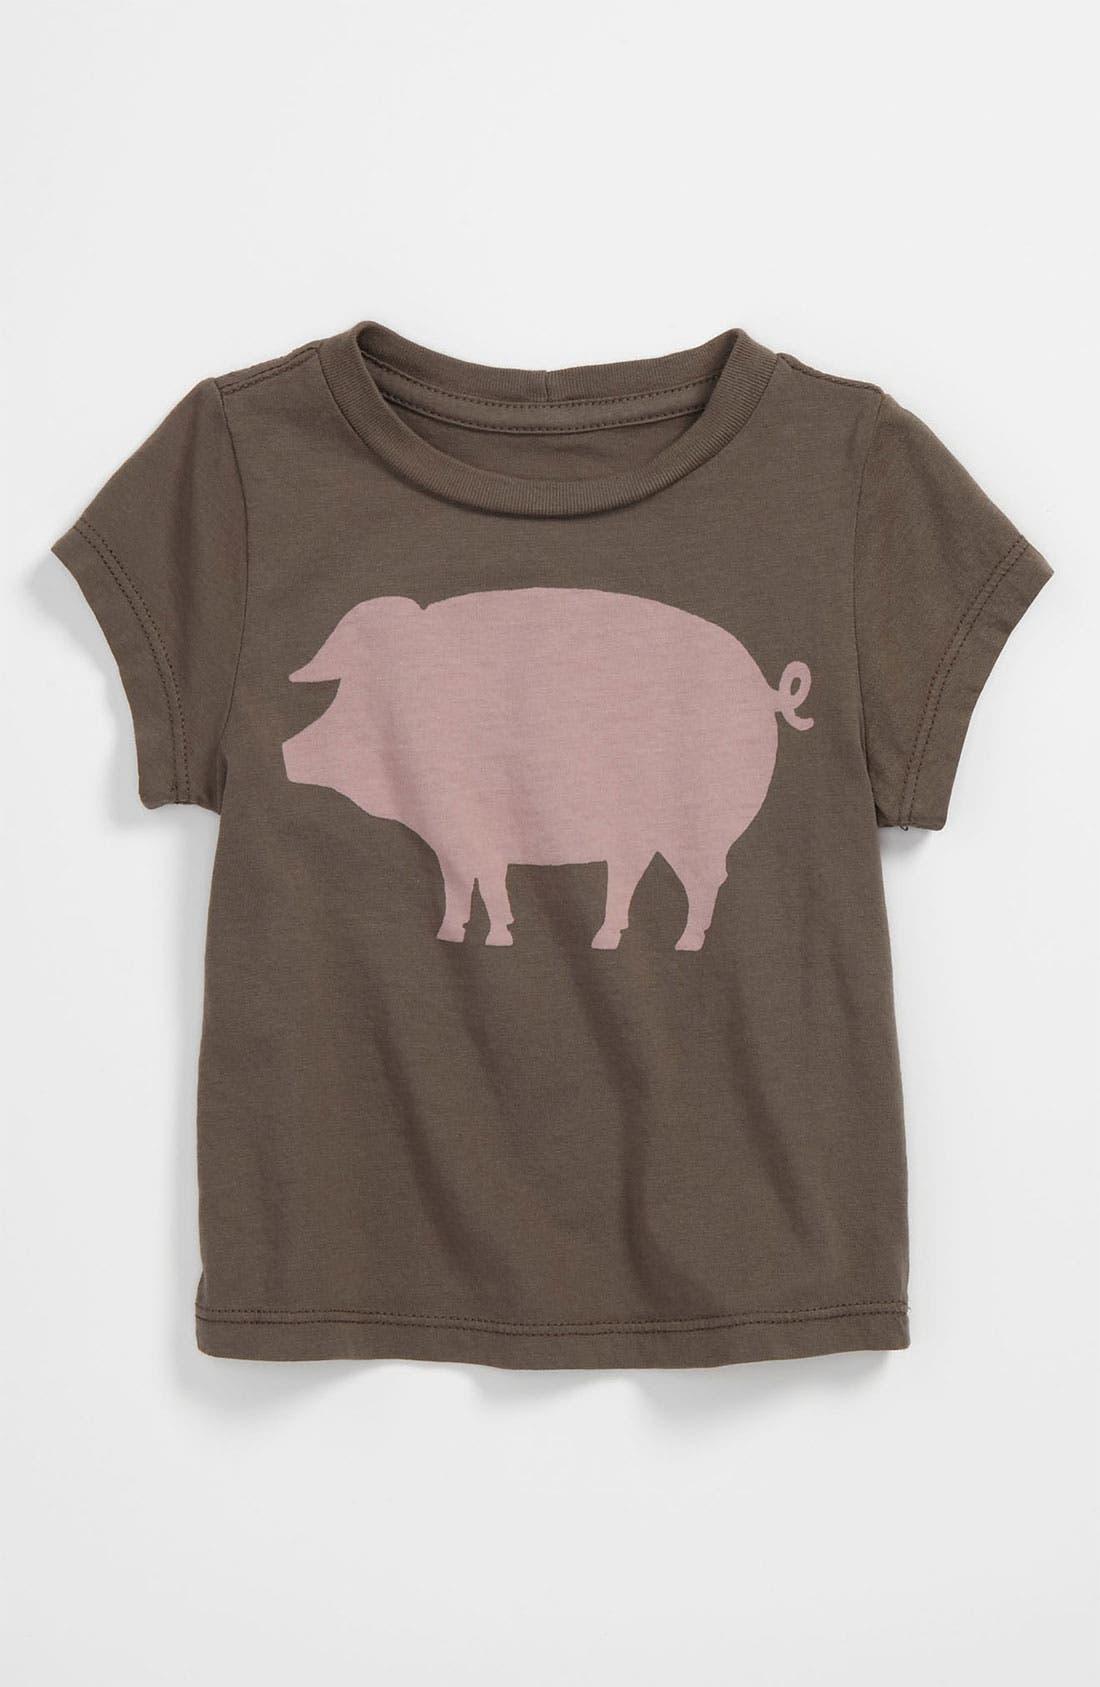 Main Image - Peek 'Oink' T-Shirt (Baby)